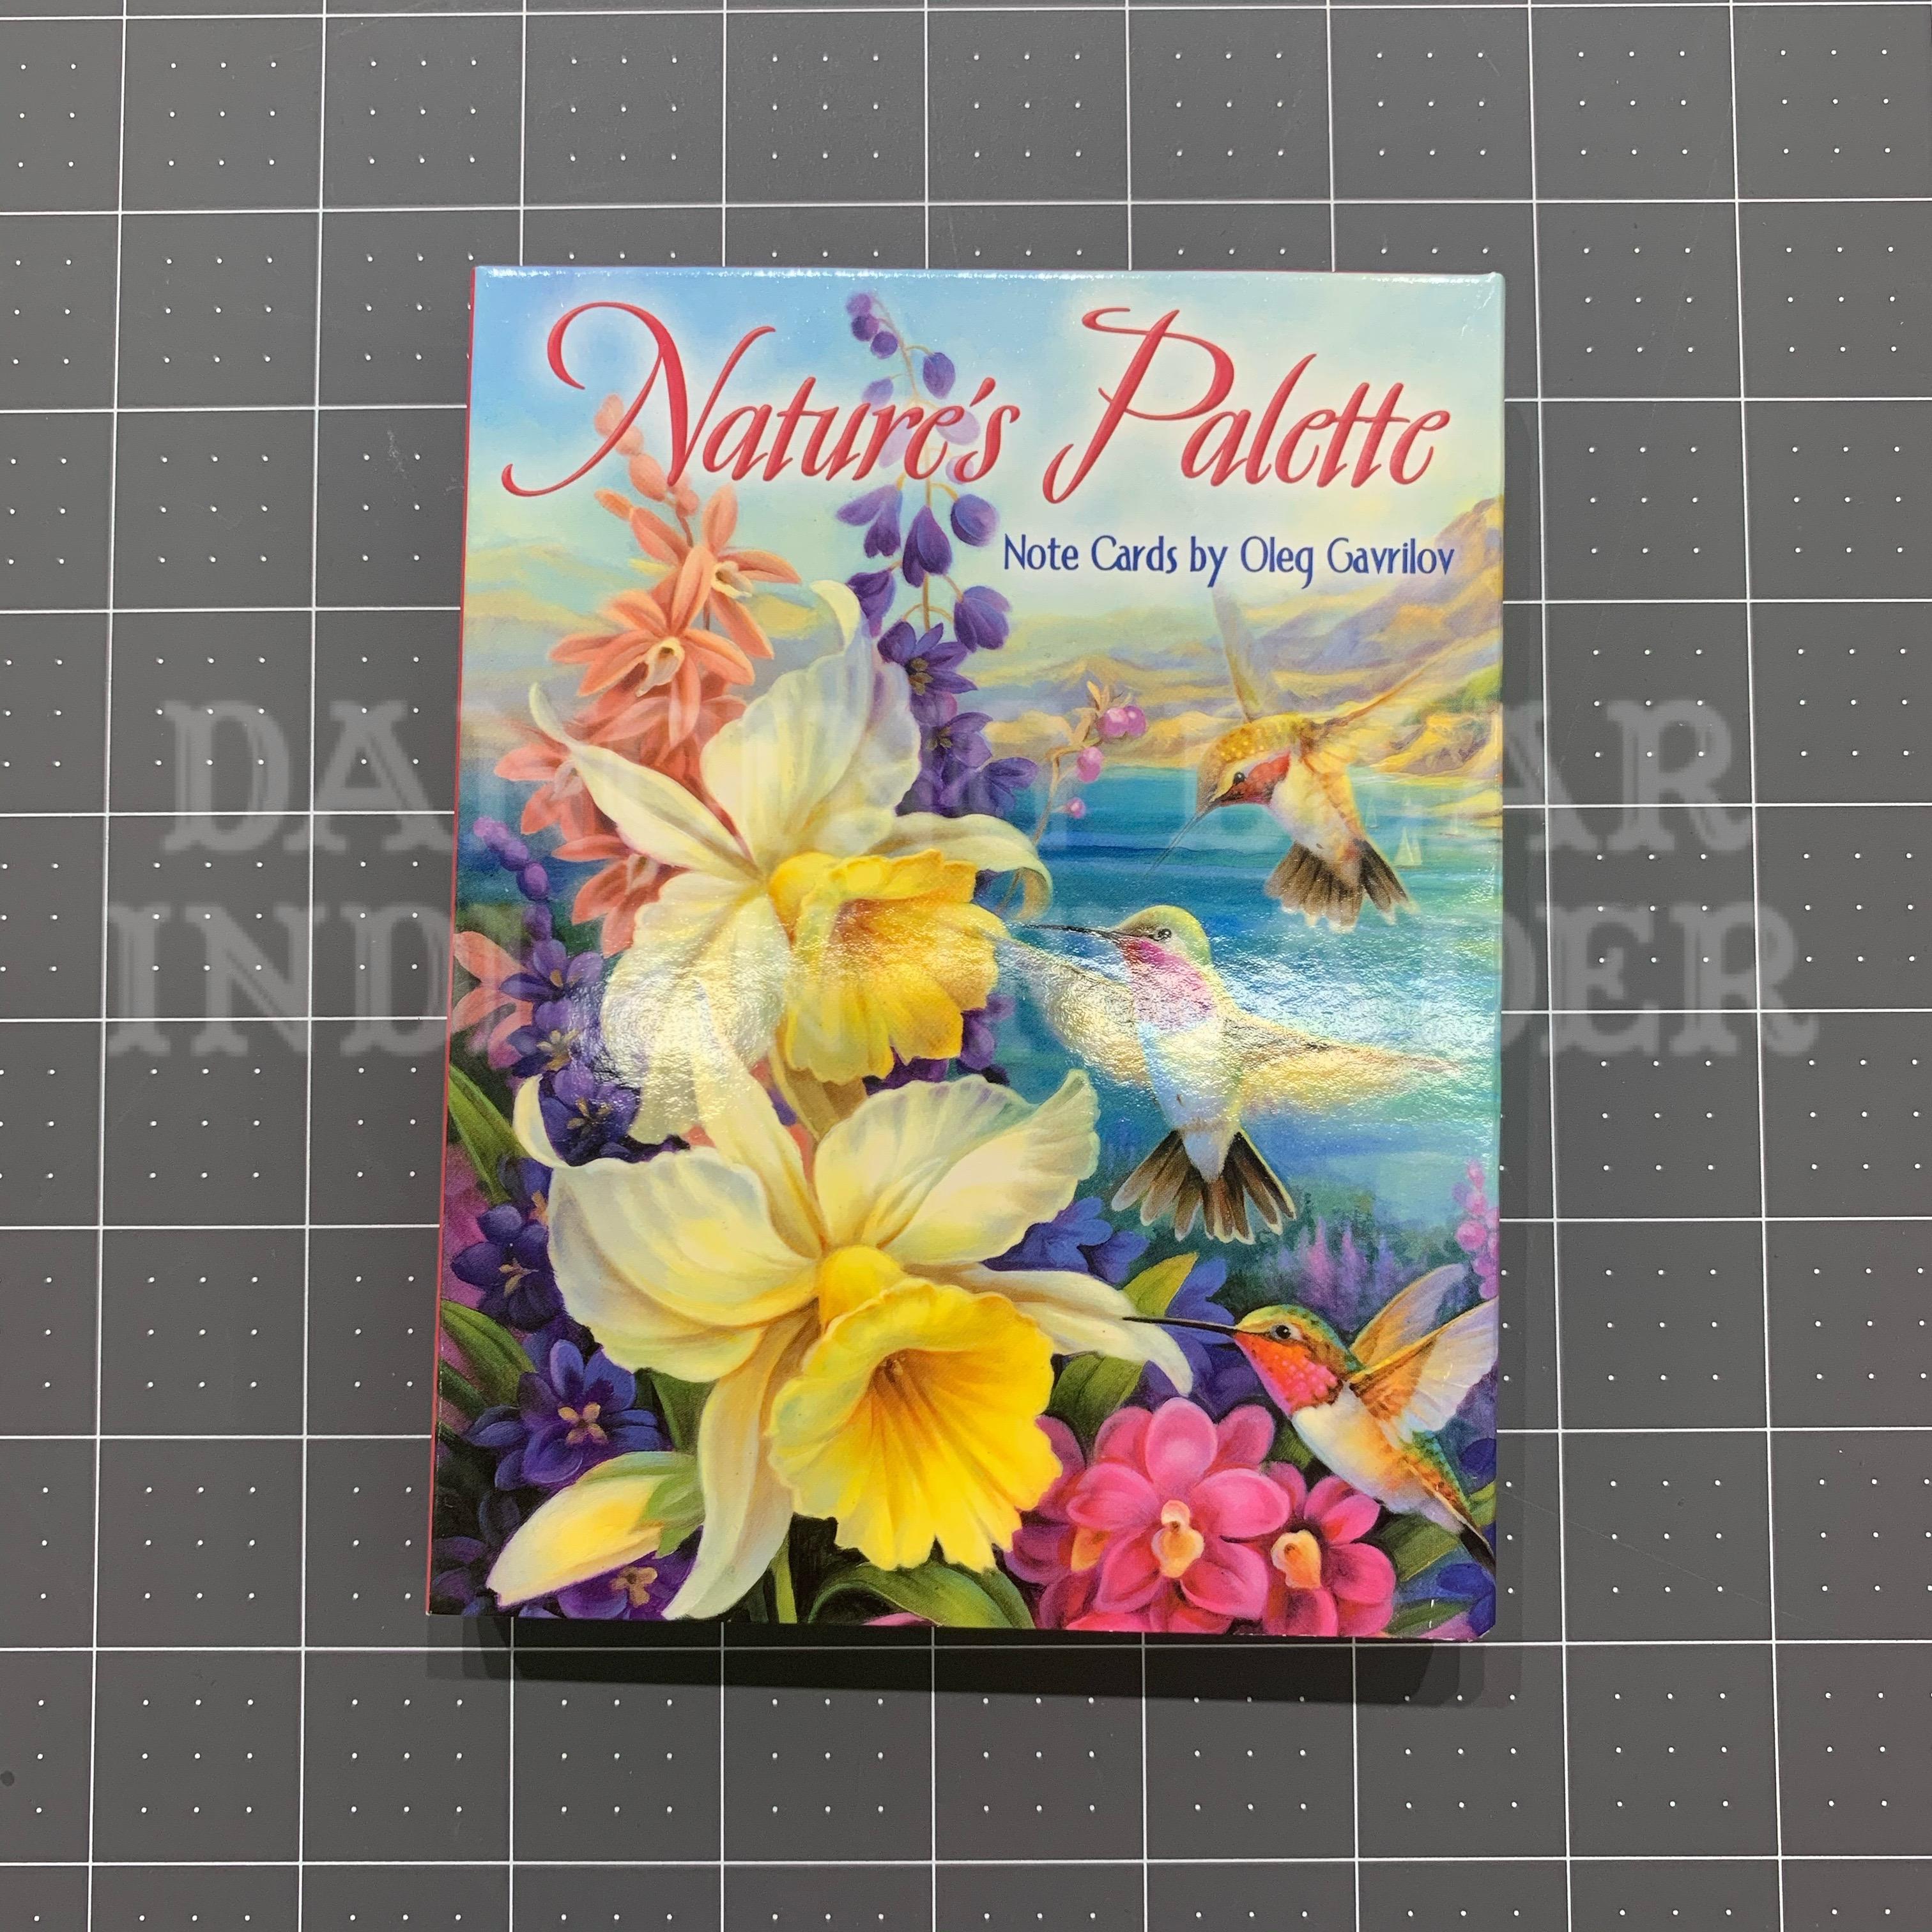 Natures Palette Note Cards by Olg Gavrilov